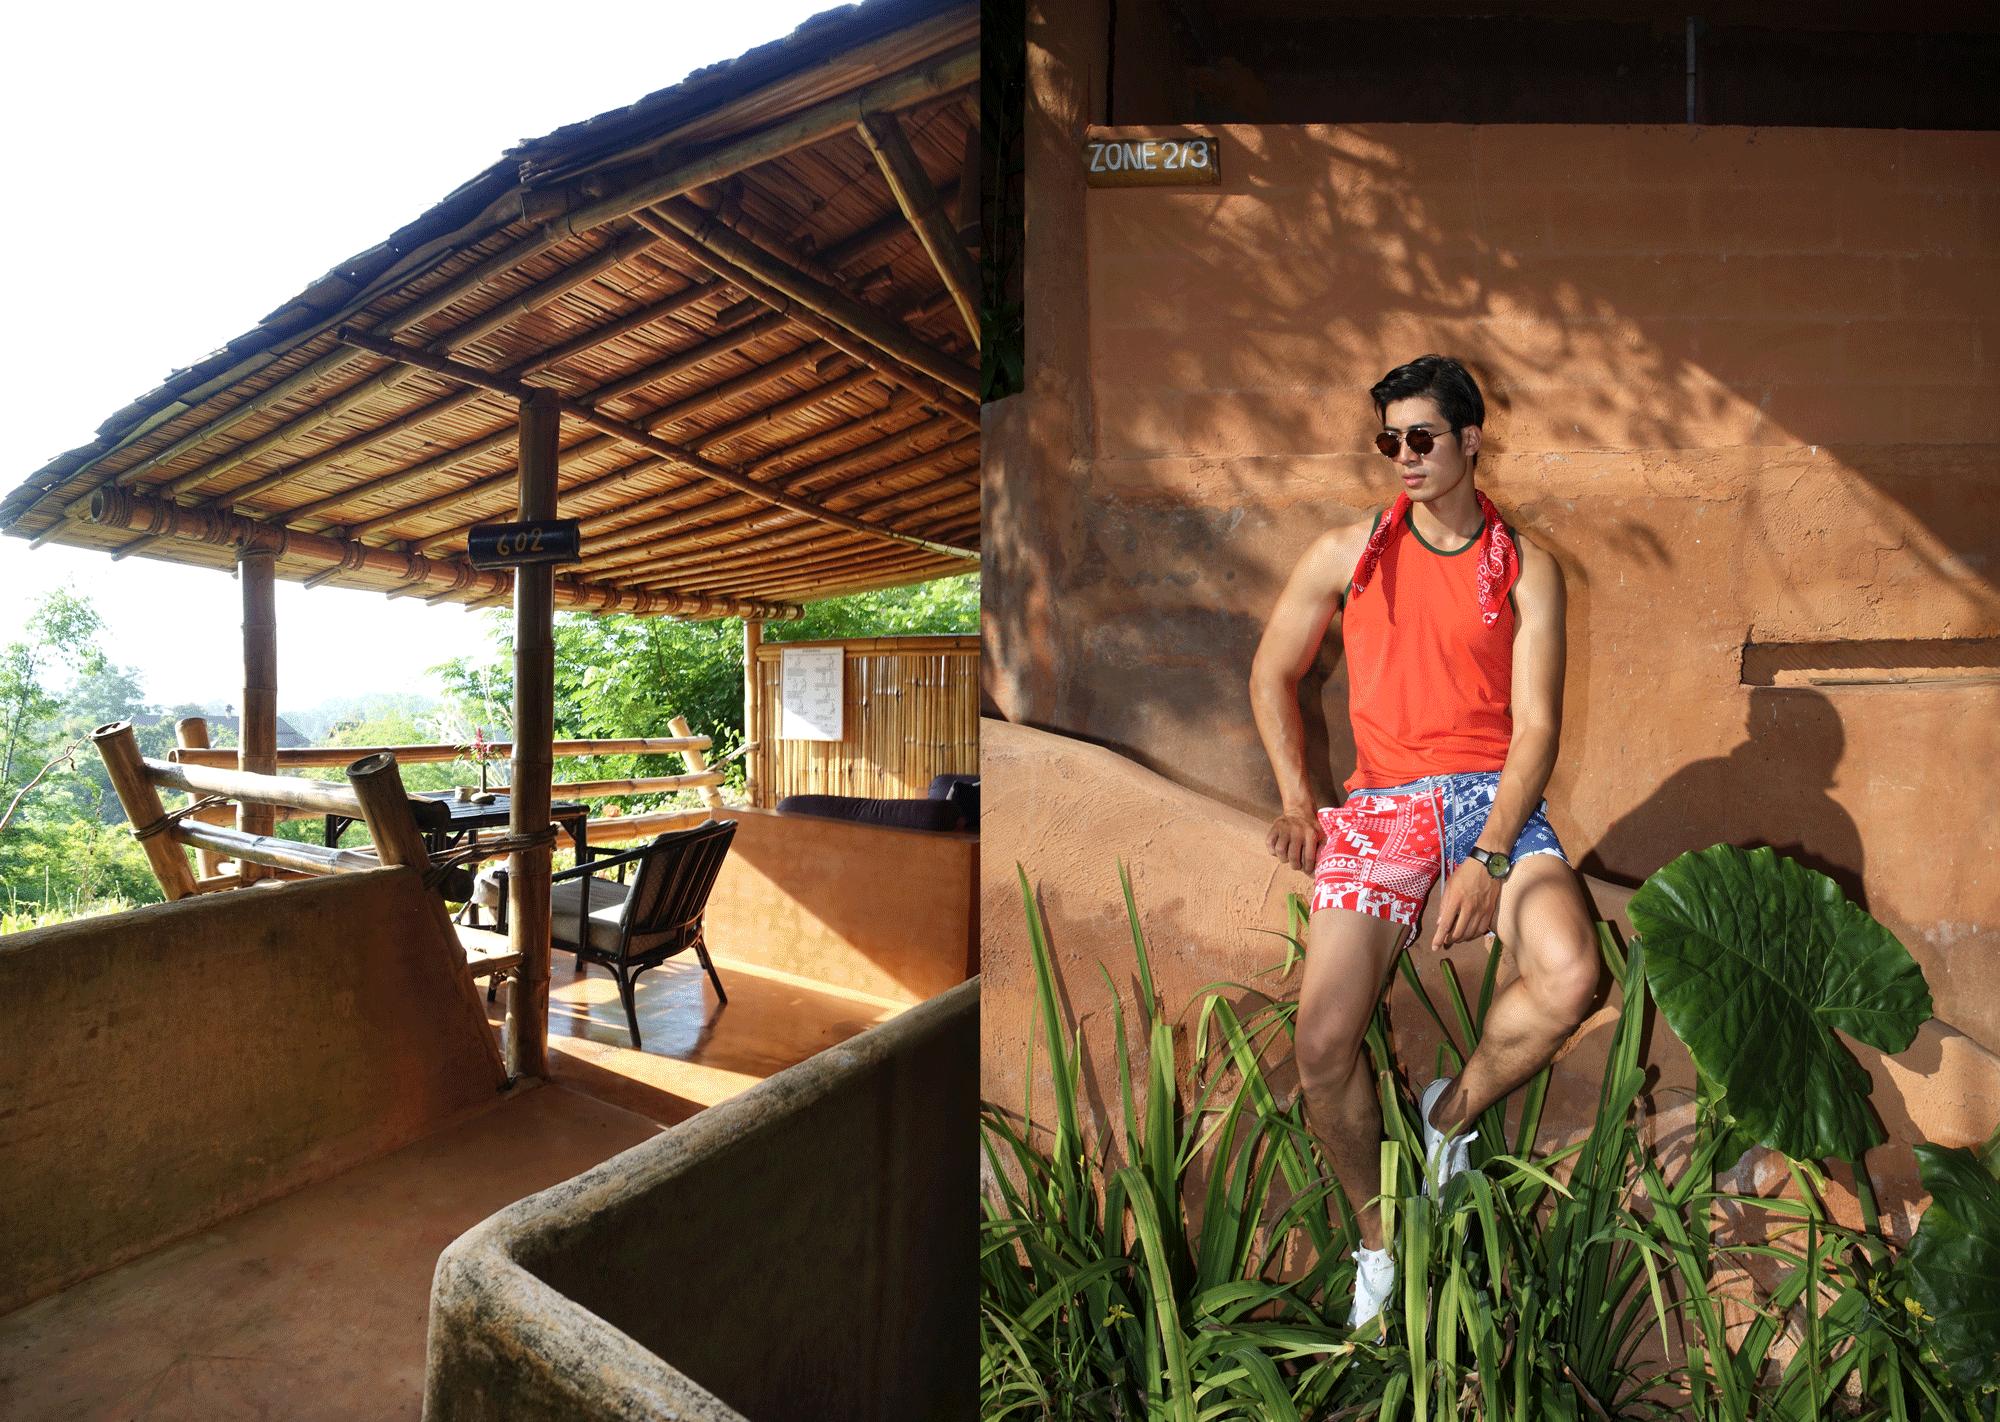 tanktop : NOXX / shorts : Salawan / watch : FORREST / sunglasses : TAVAT